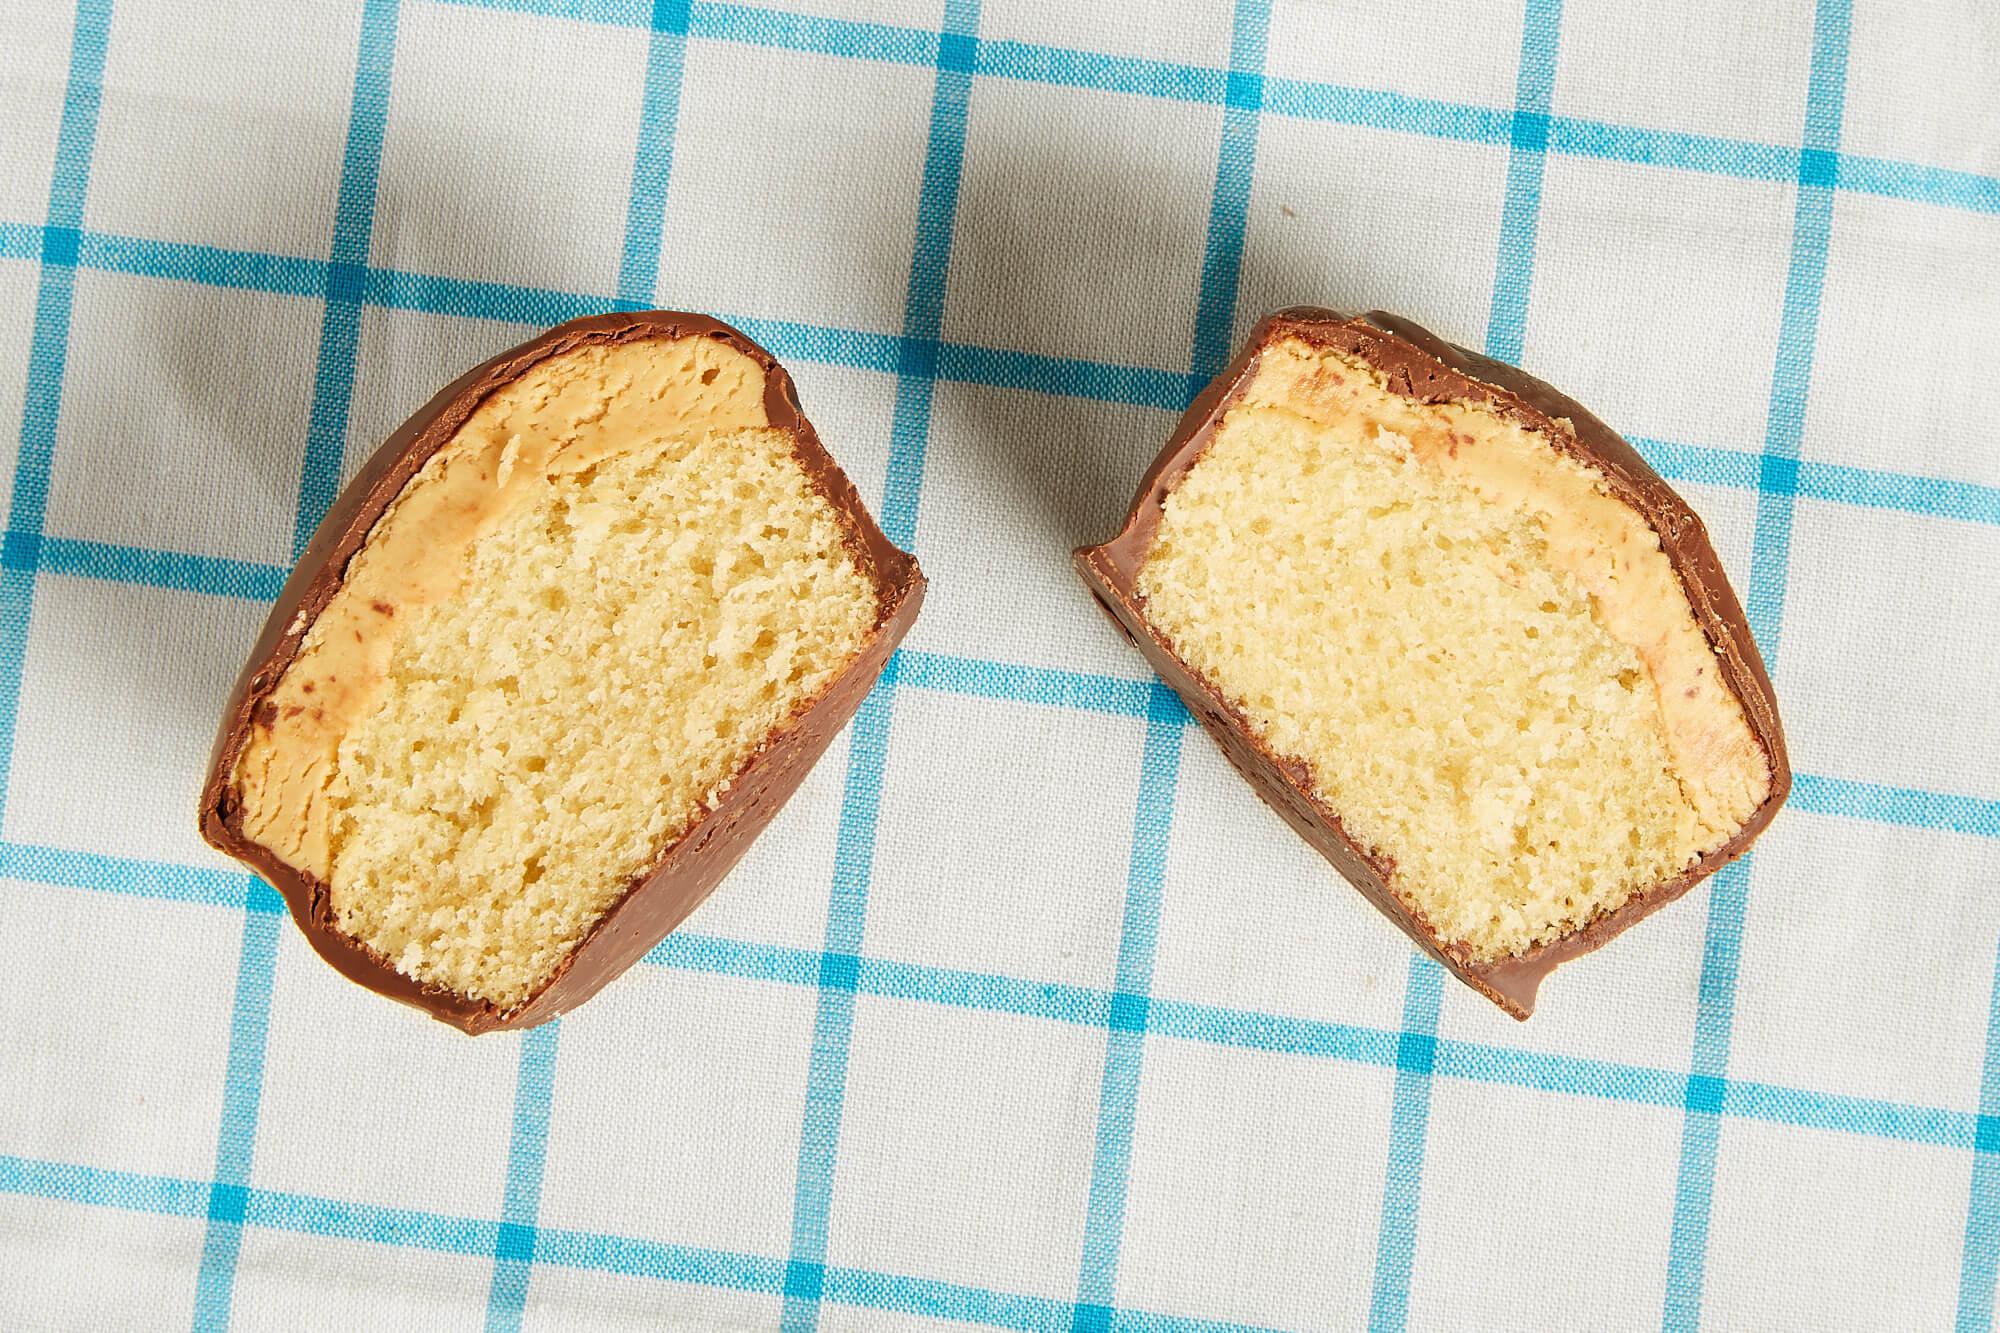 Vegan Wholesale Bakery Philly Cakes